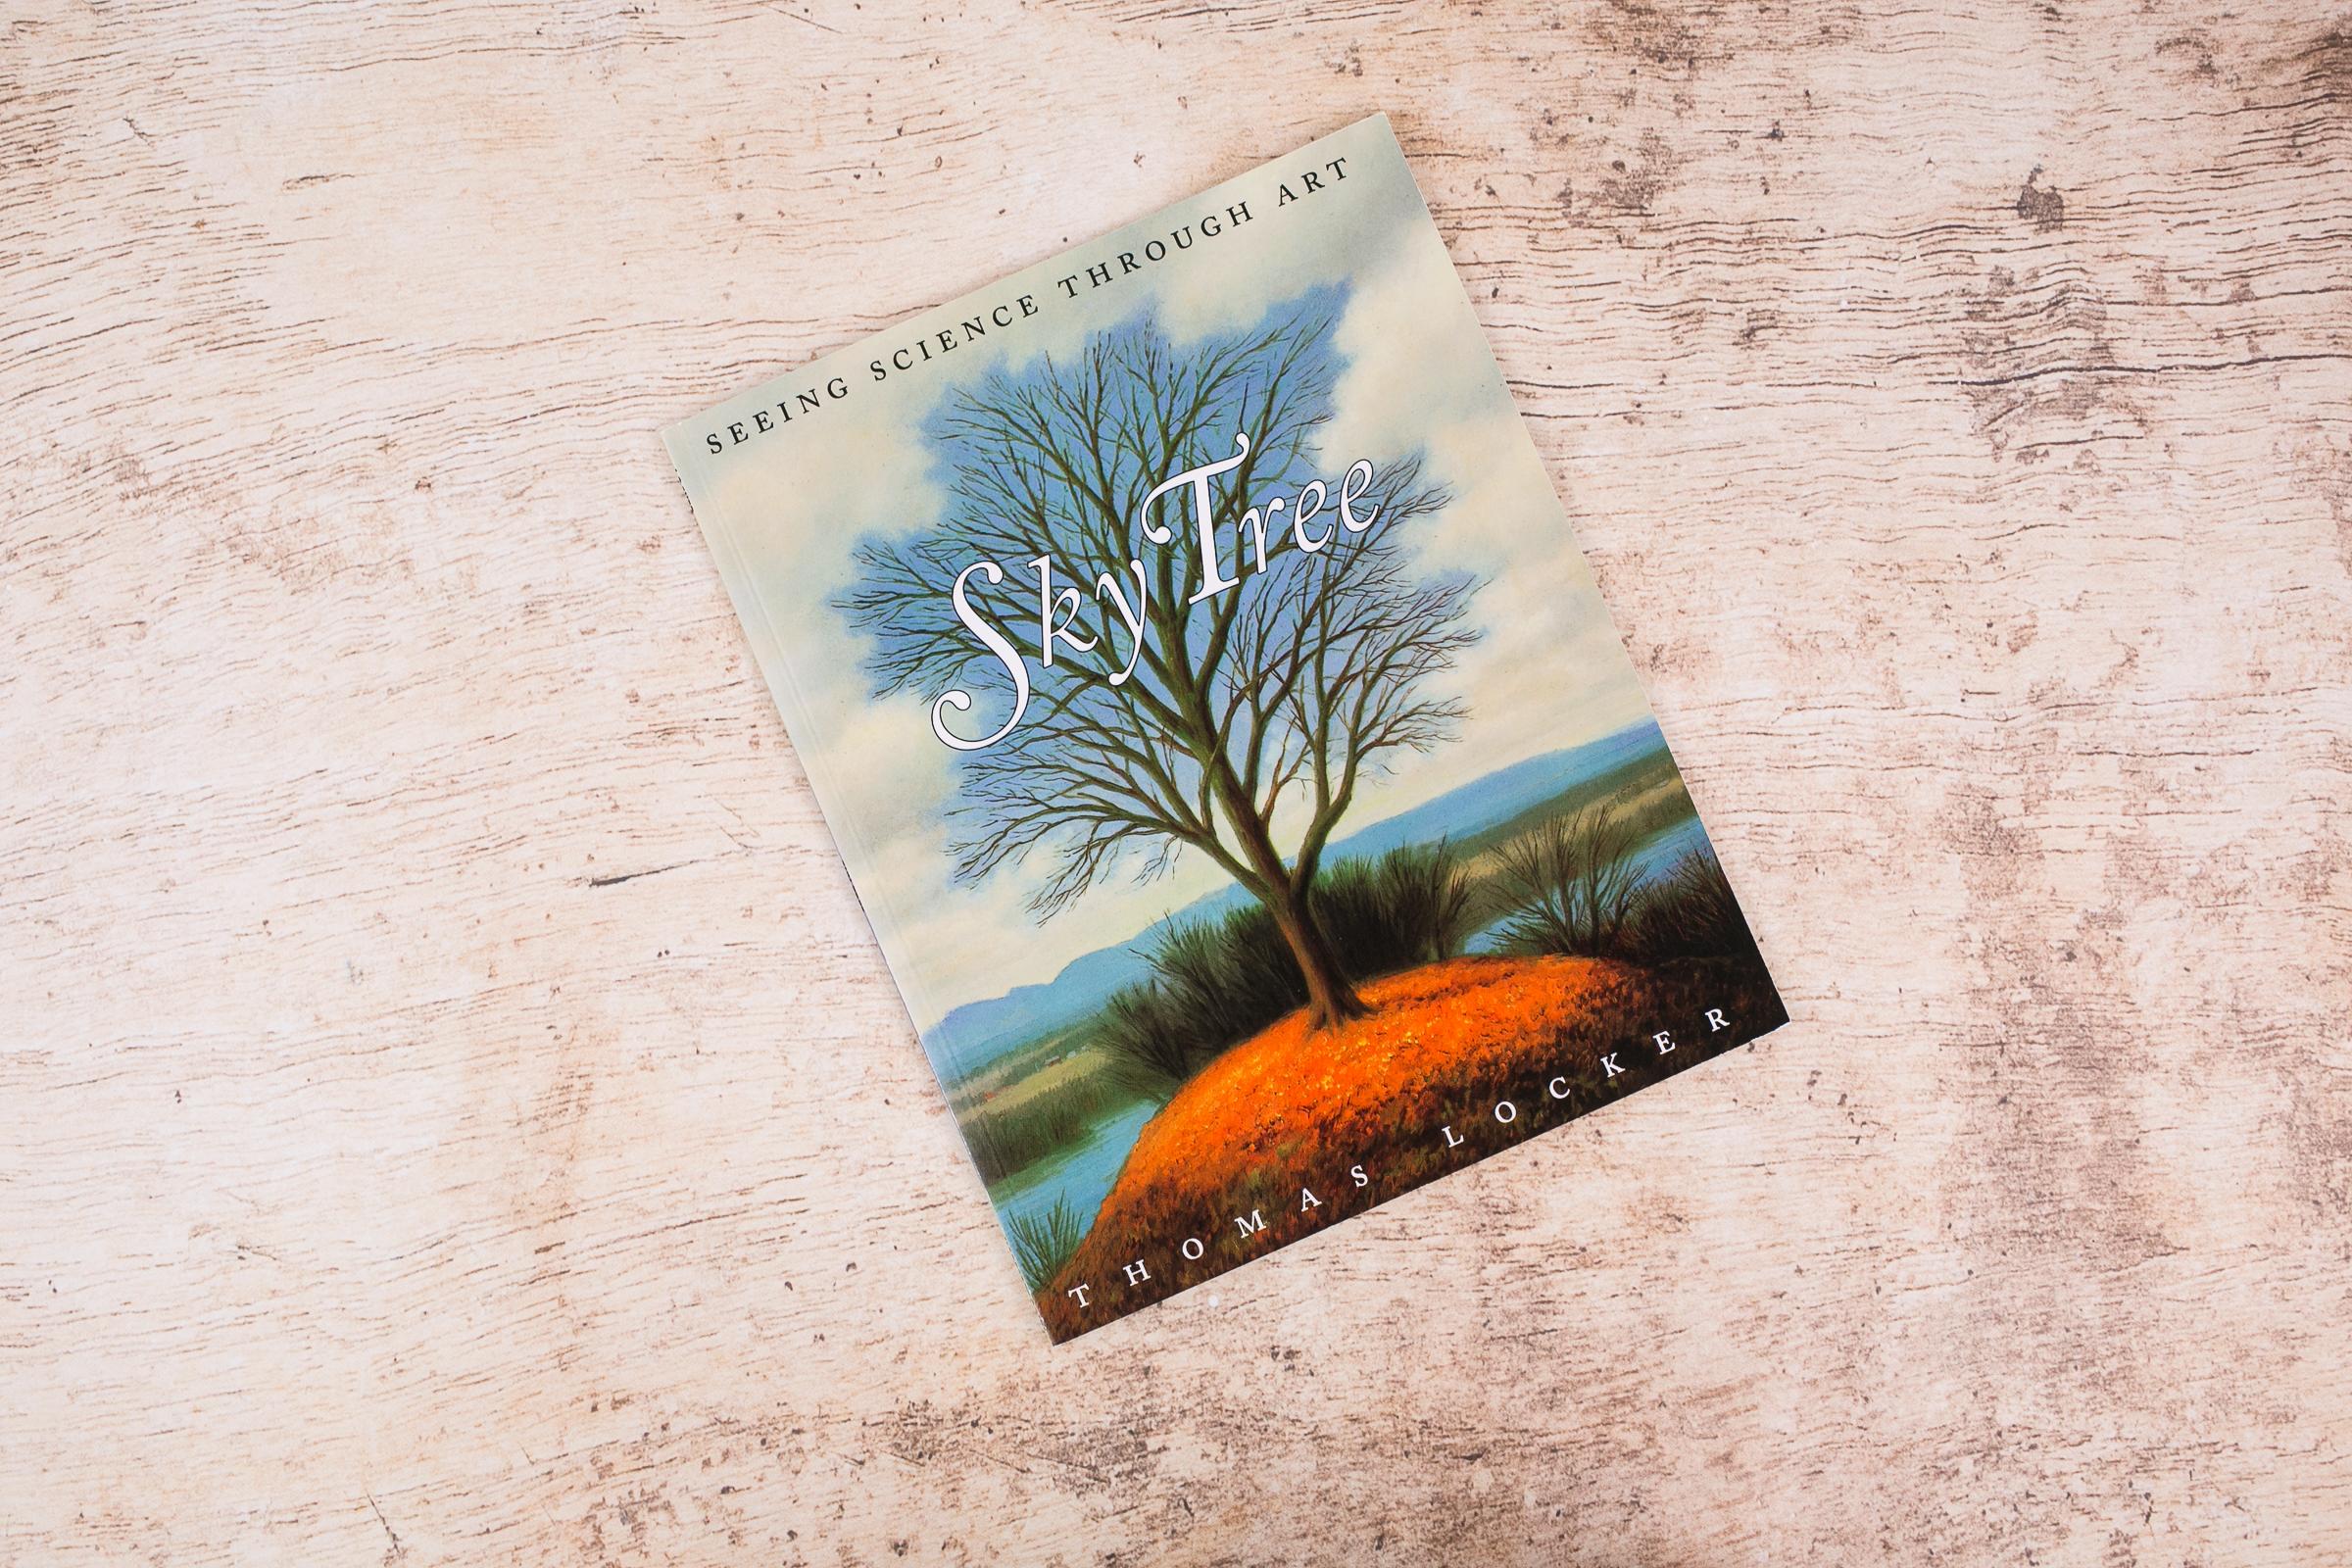 Sky Tree by Thomas Locker, found in the Wonderkin Tree Box